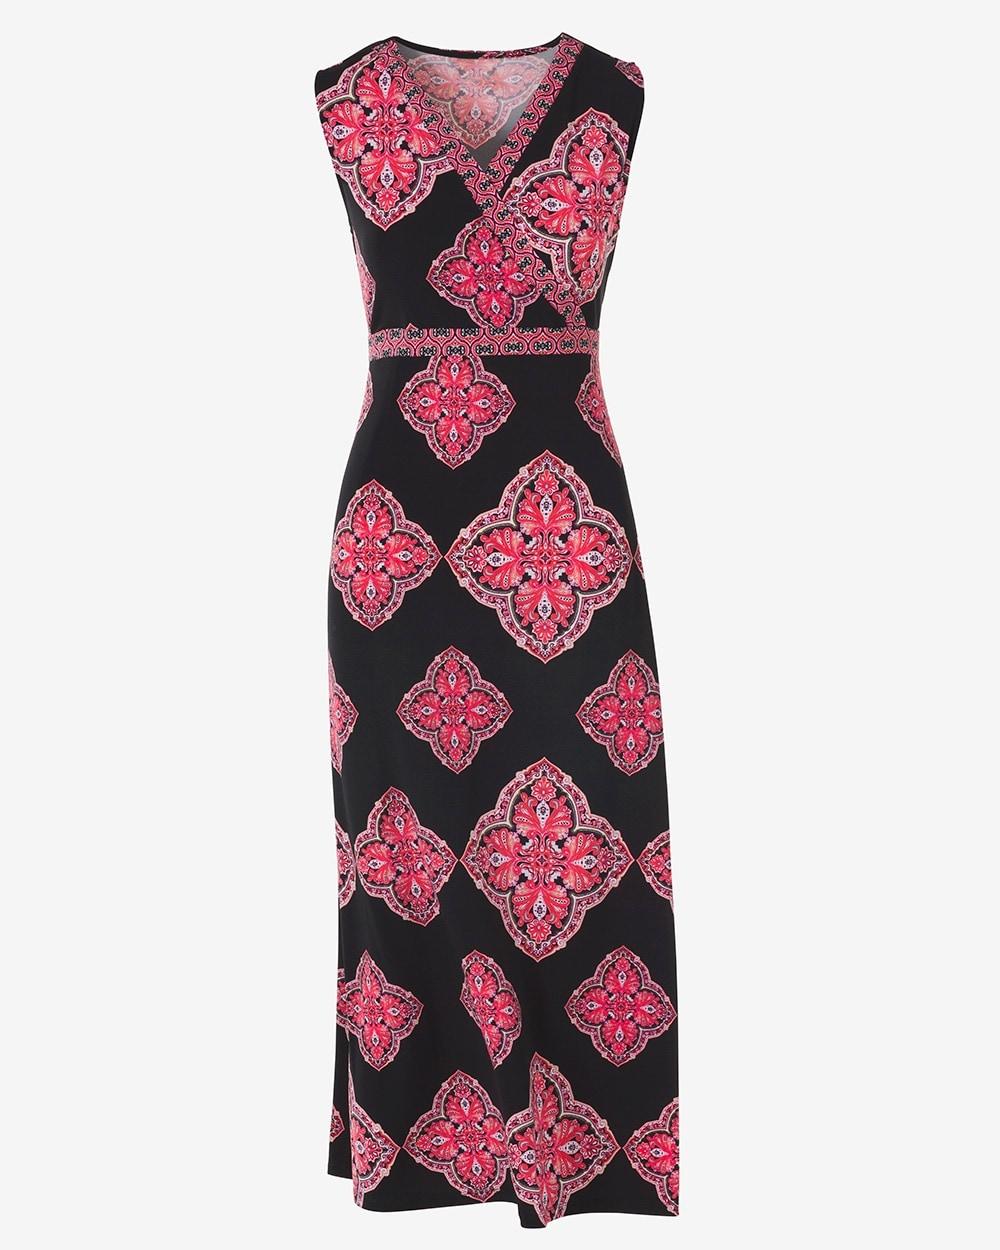 a0f15ce27a Malaga Tile Empire-Neck Maxi Dress - Chico's Off The Rack - Chico's ...